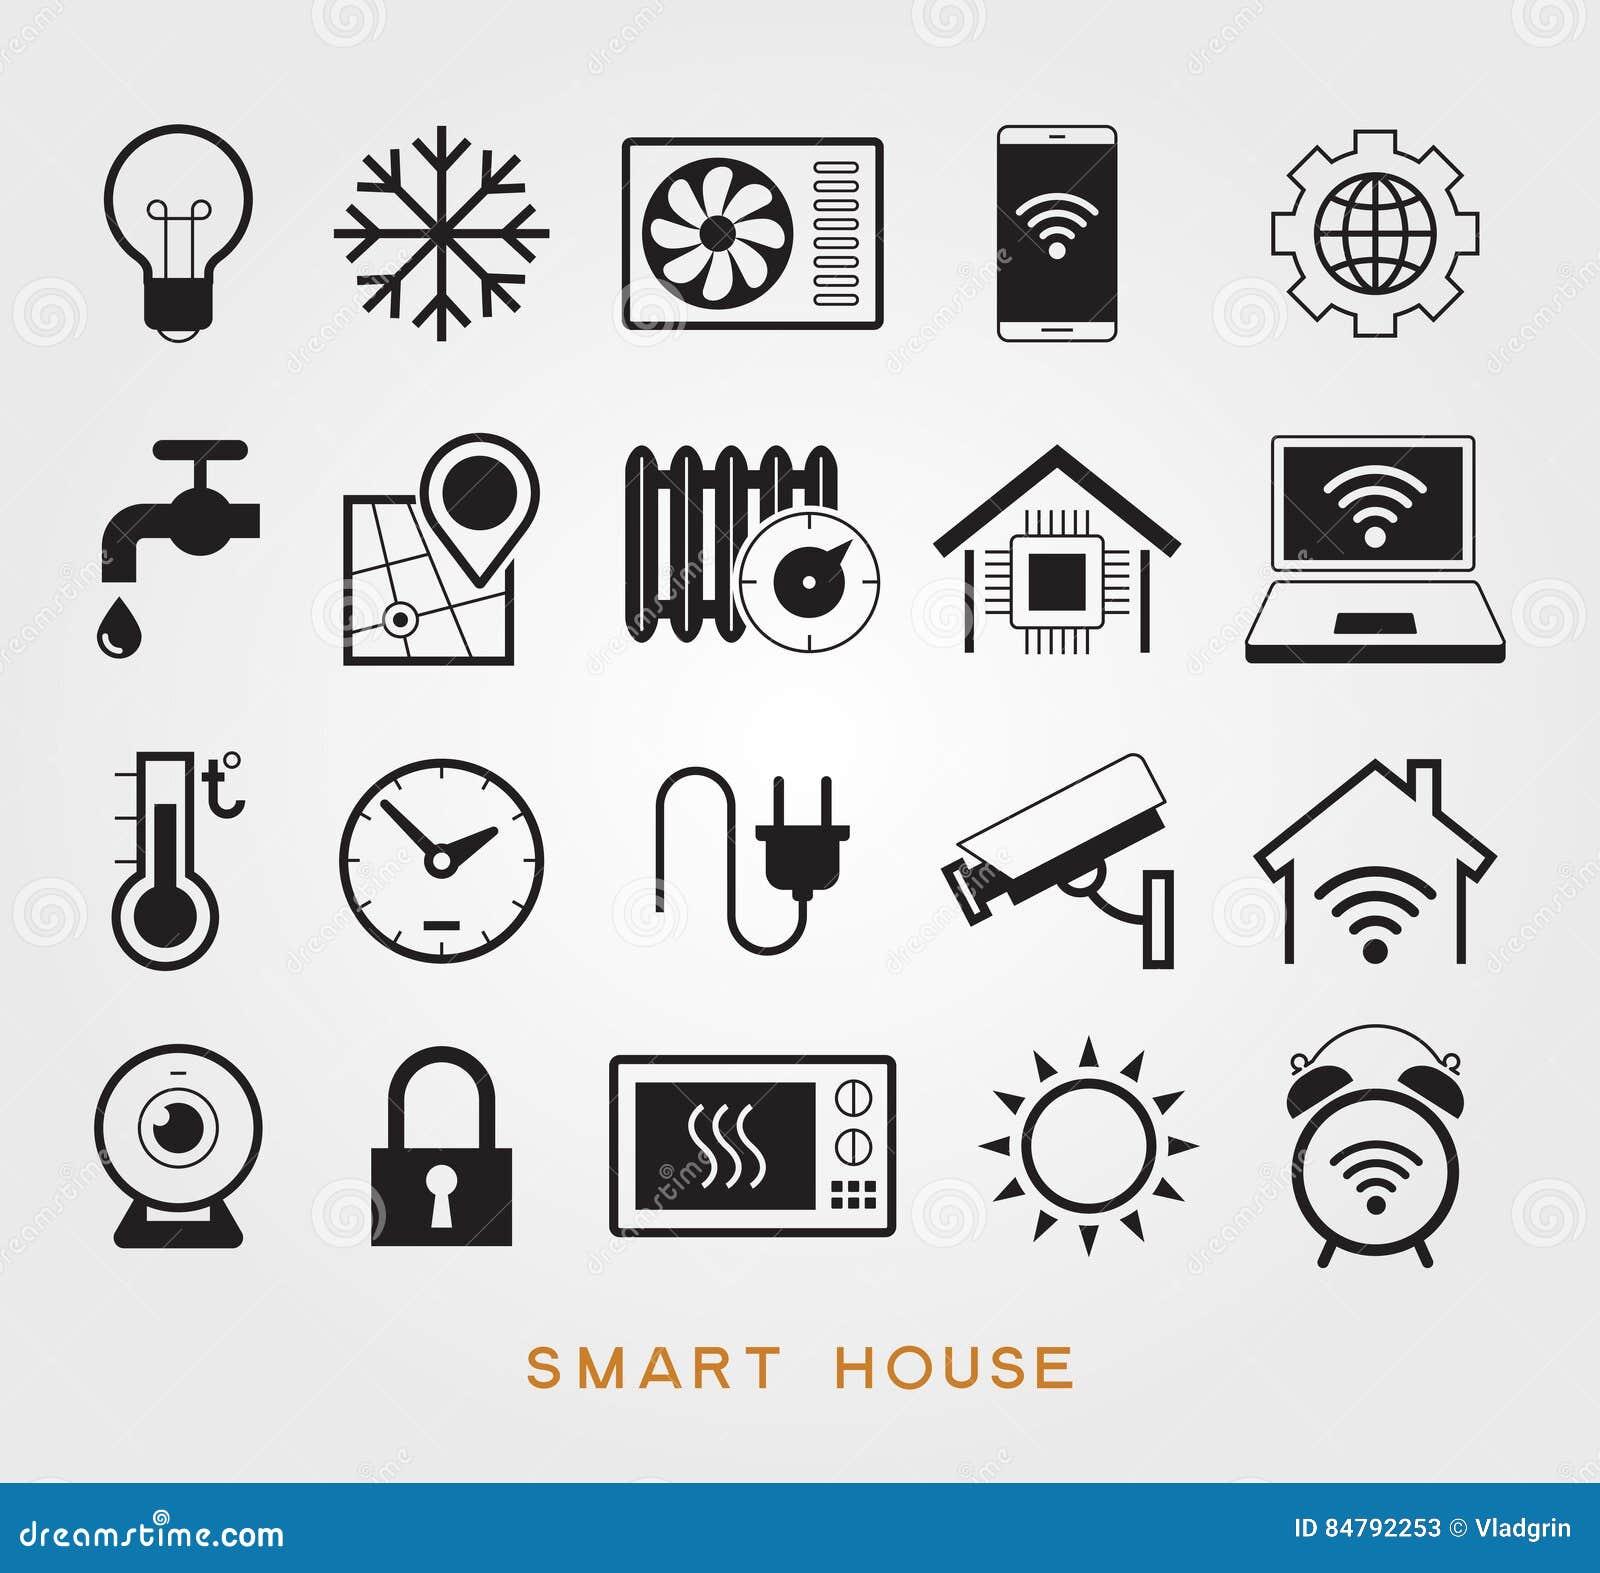 smart house black icons set cartoon vector cartoondealer. Black Bedroom Furniture Sets. Home Design Ideas